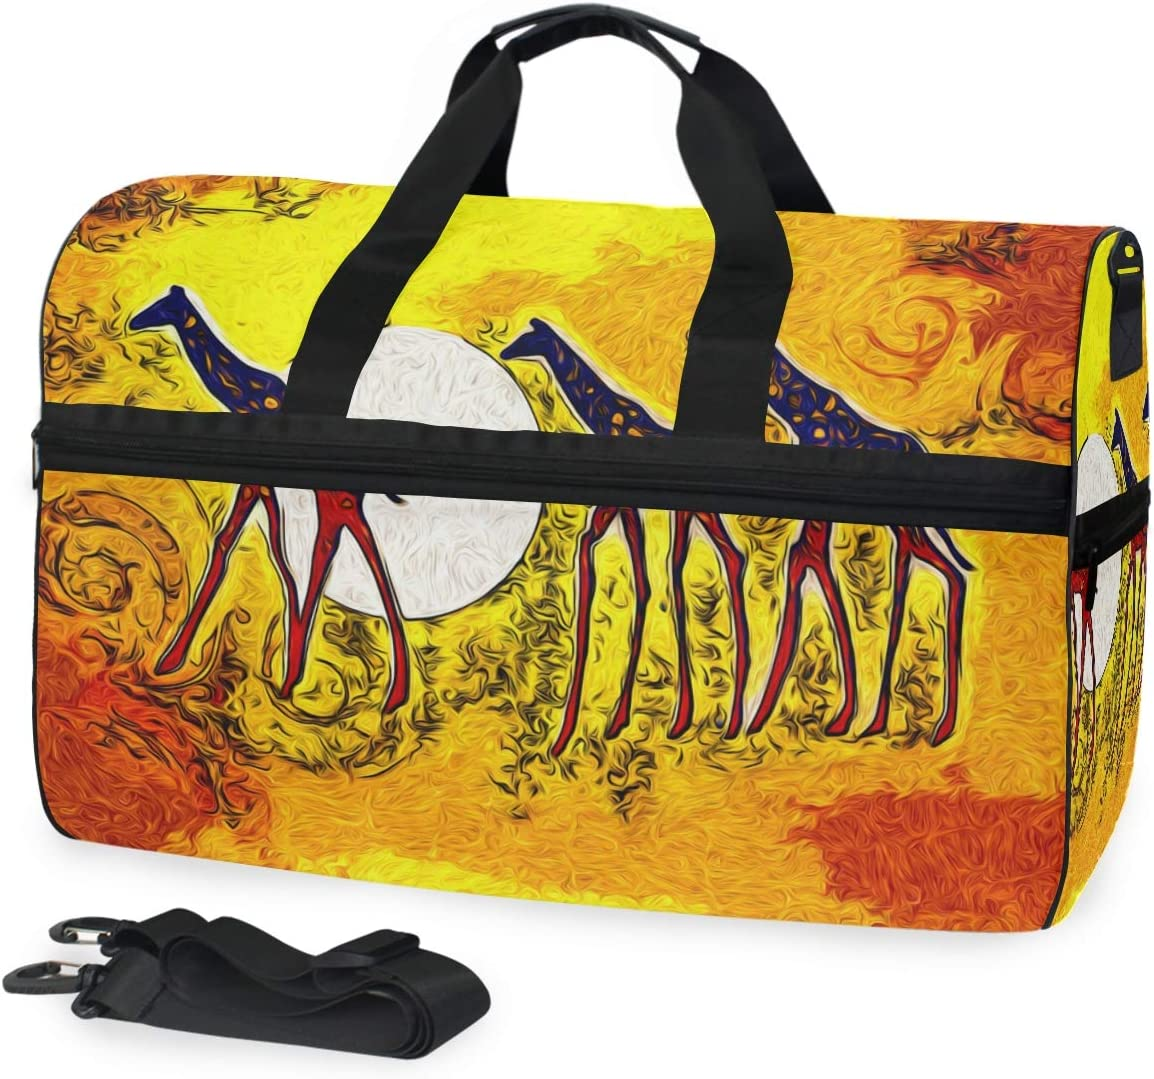 TFONE Vintage African Giraffe Duffel Bag Sports Gym Weekend Bags with Shoe Compartmen